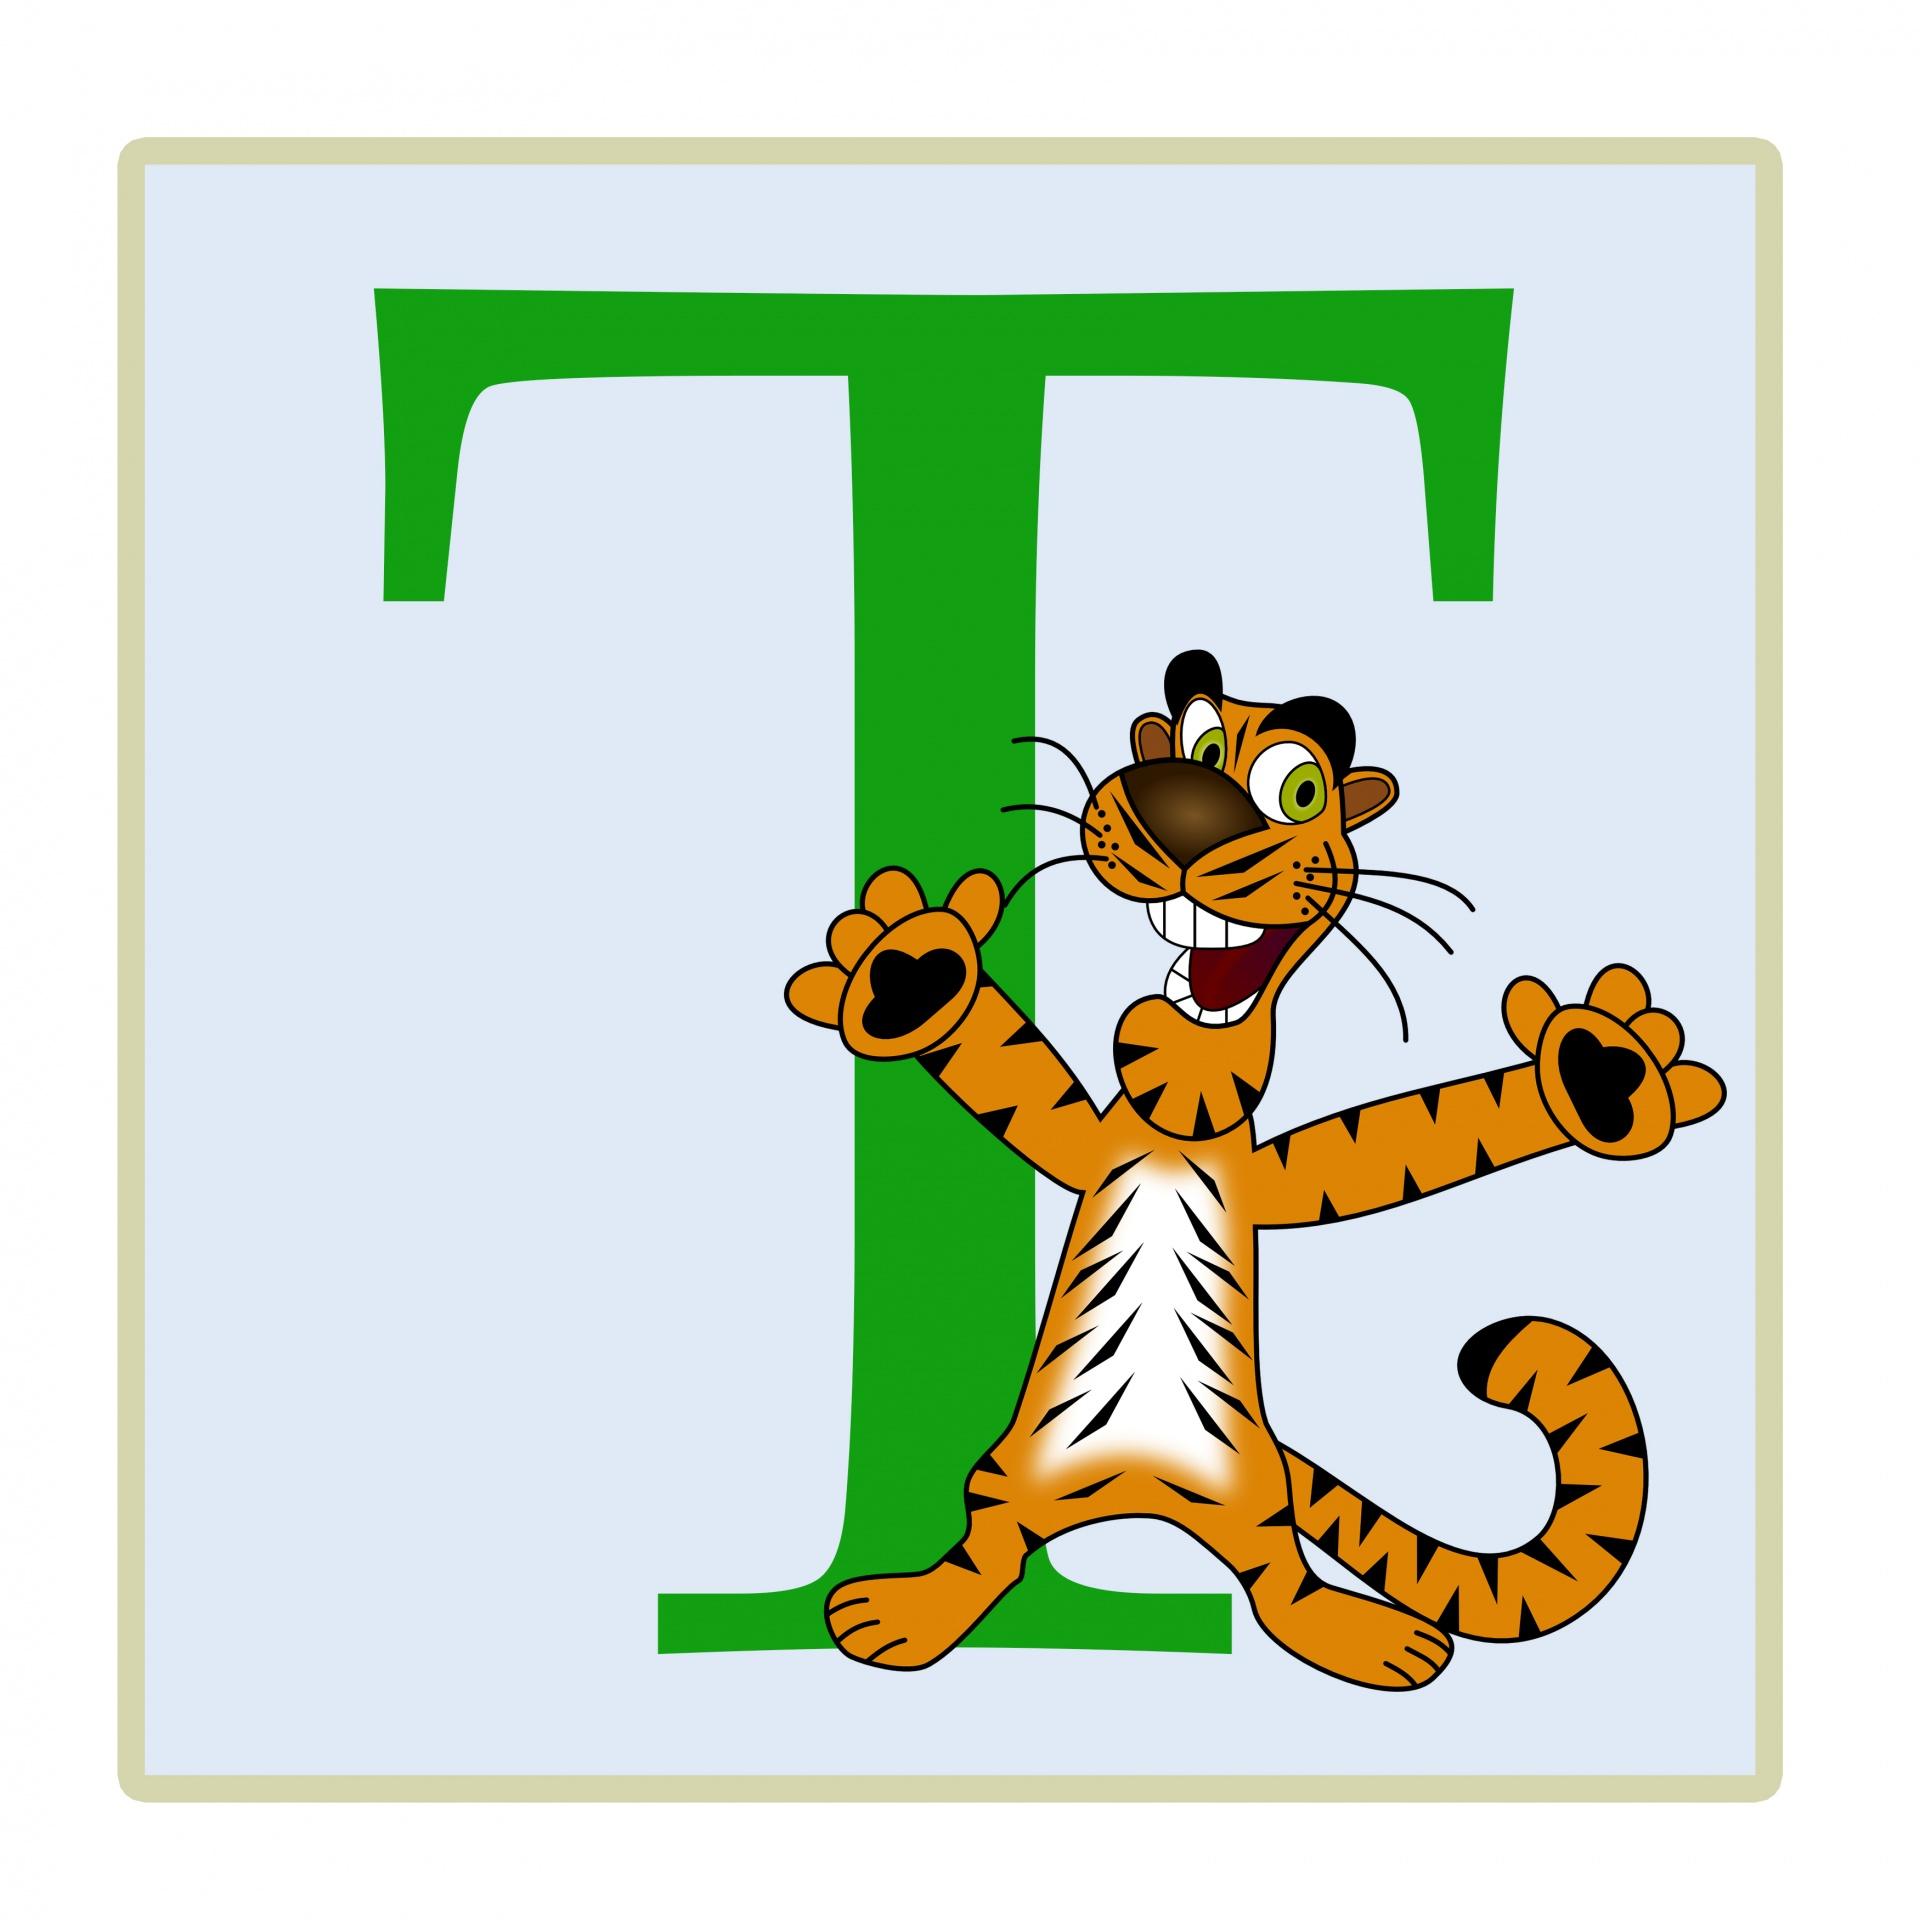 Letter T Tiger Illustration Free Stock Photo